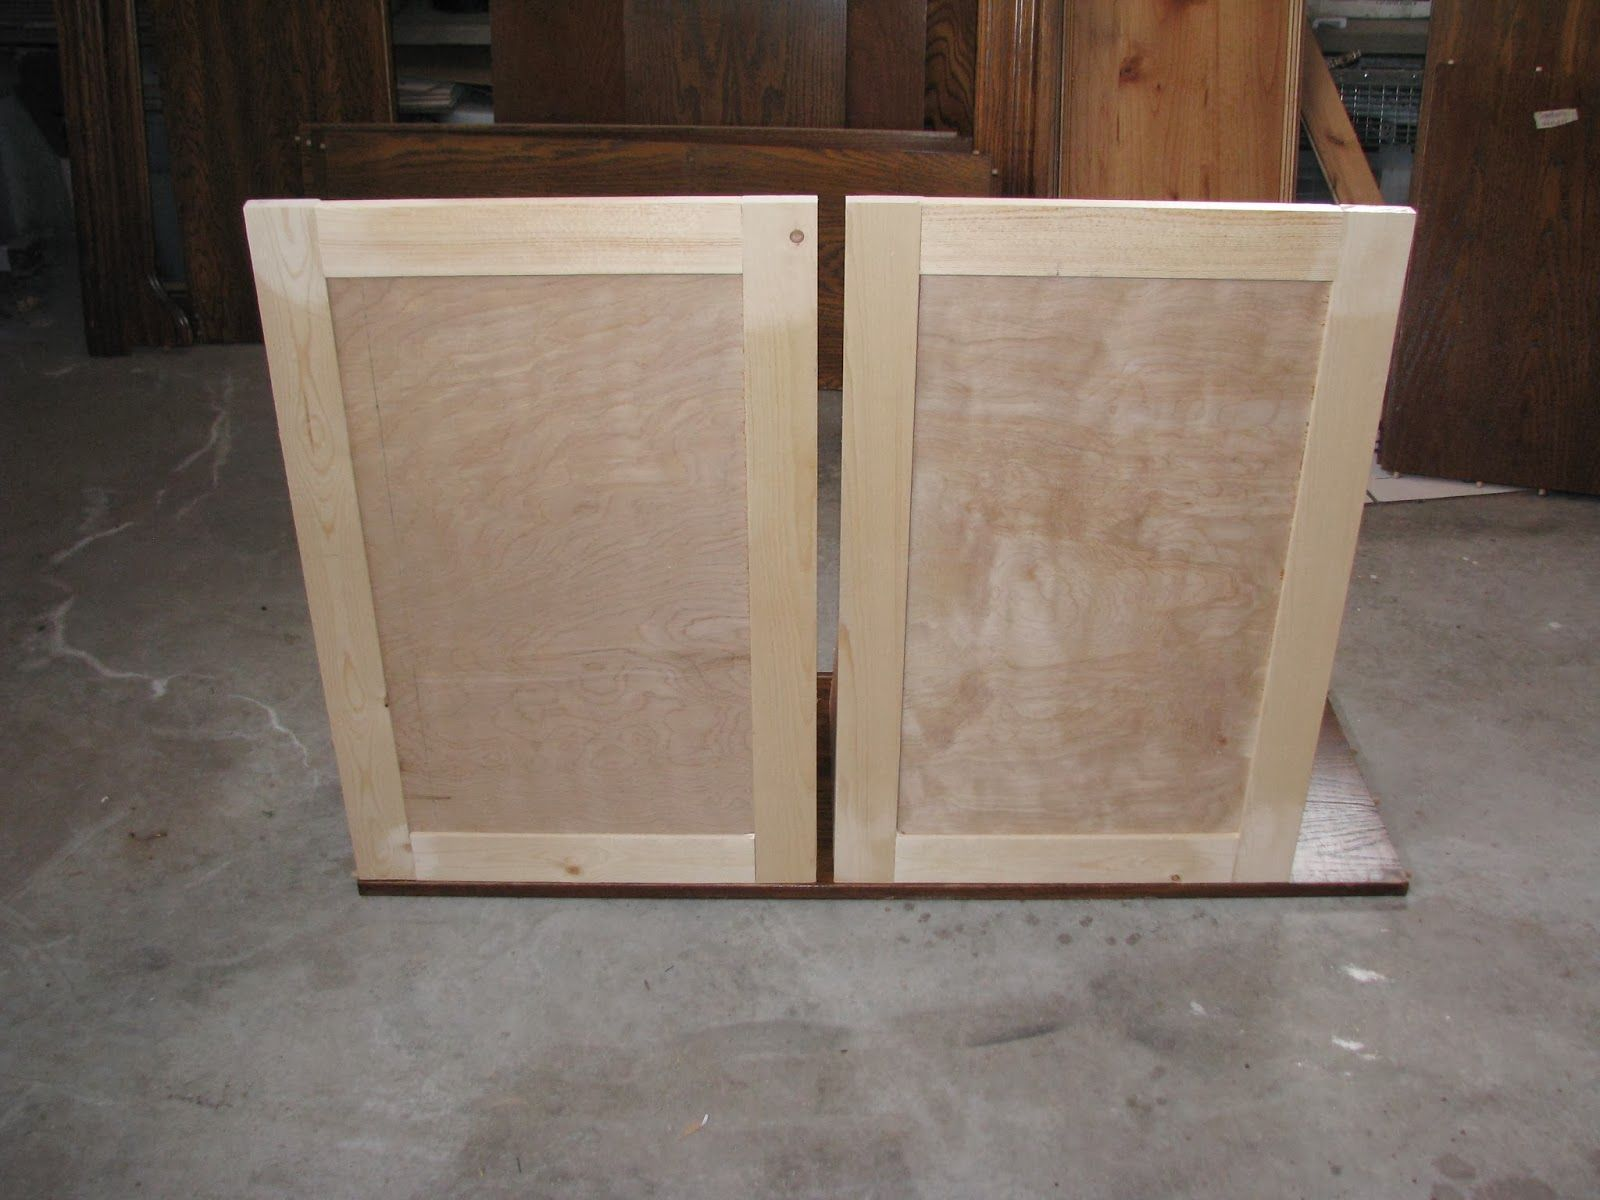 Making Kitchen Cabinet Doors Shelving For Pantry Using A Kreg Jig Diy Furniture Fix